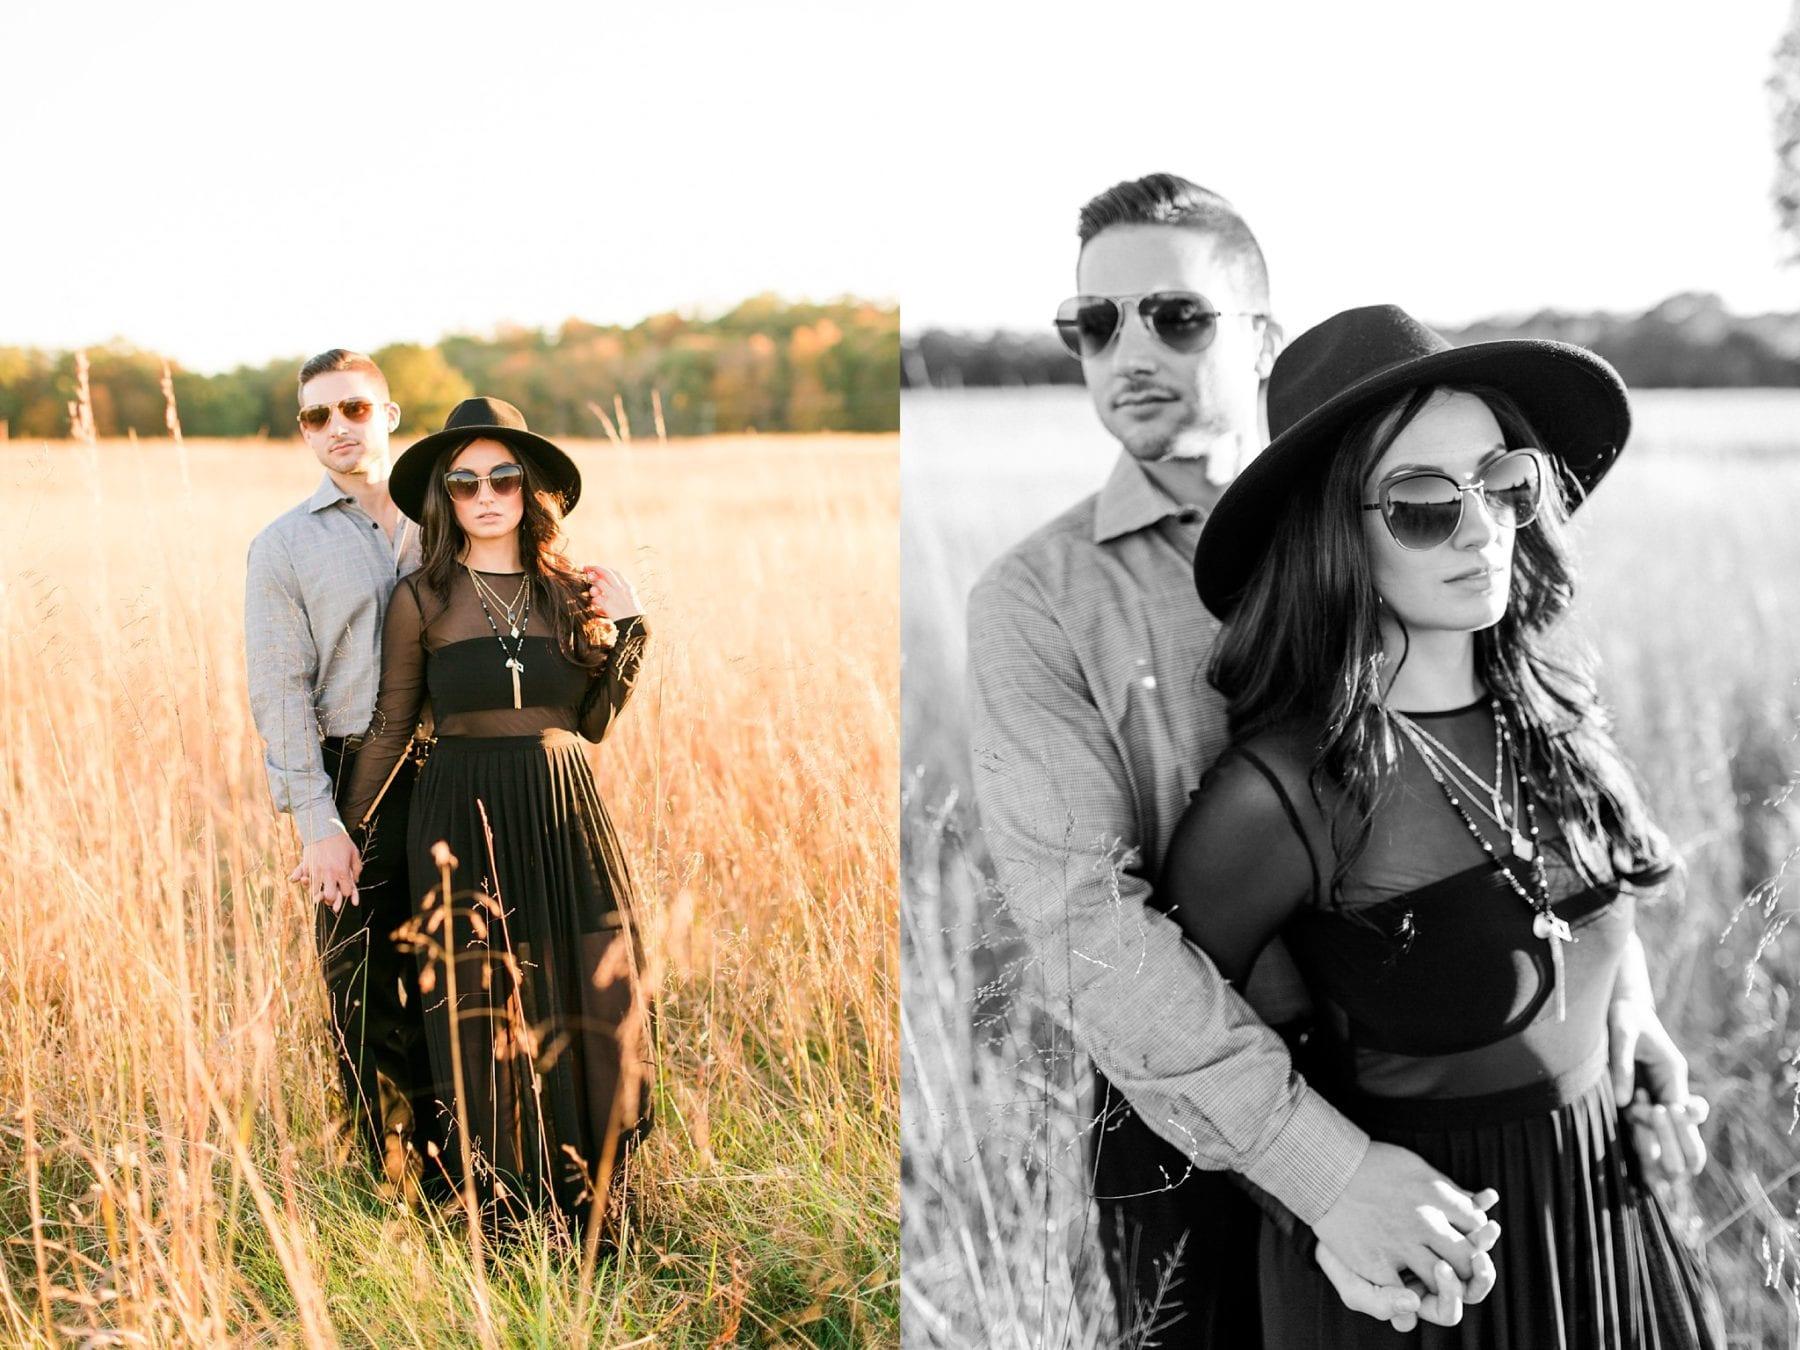 Manassas Battlefield Portraits Virginia Wedding Photographer Megan Kelsey Photography Lianne & Chris-206.jpg